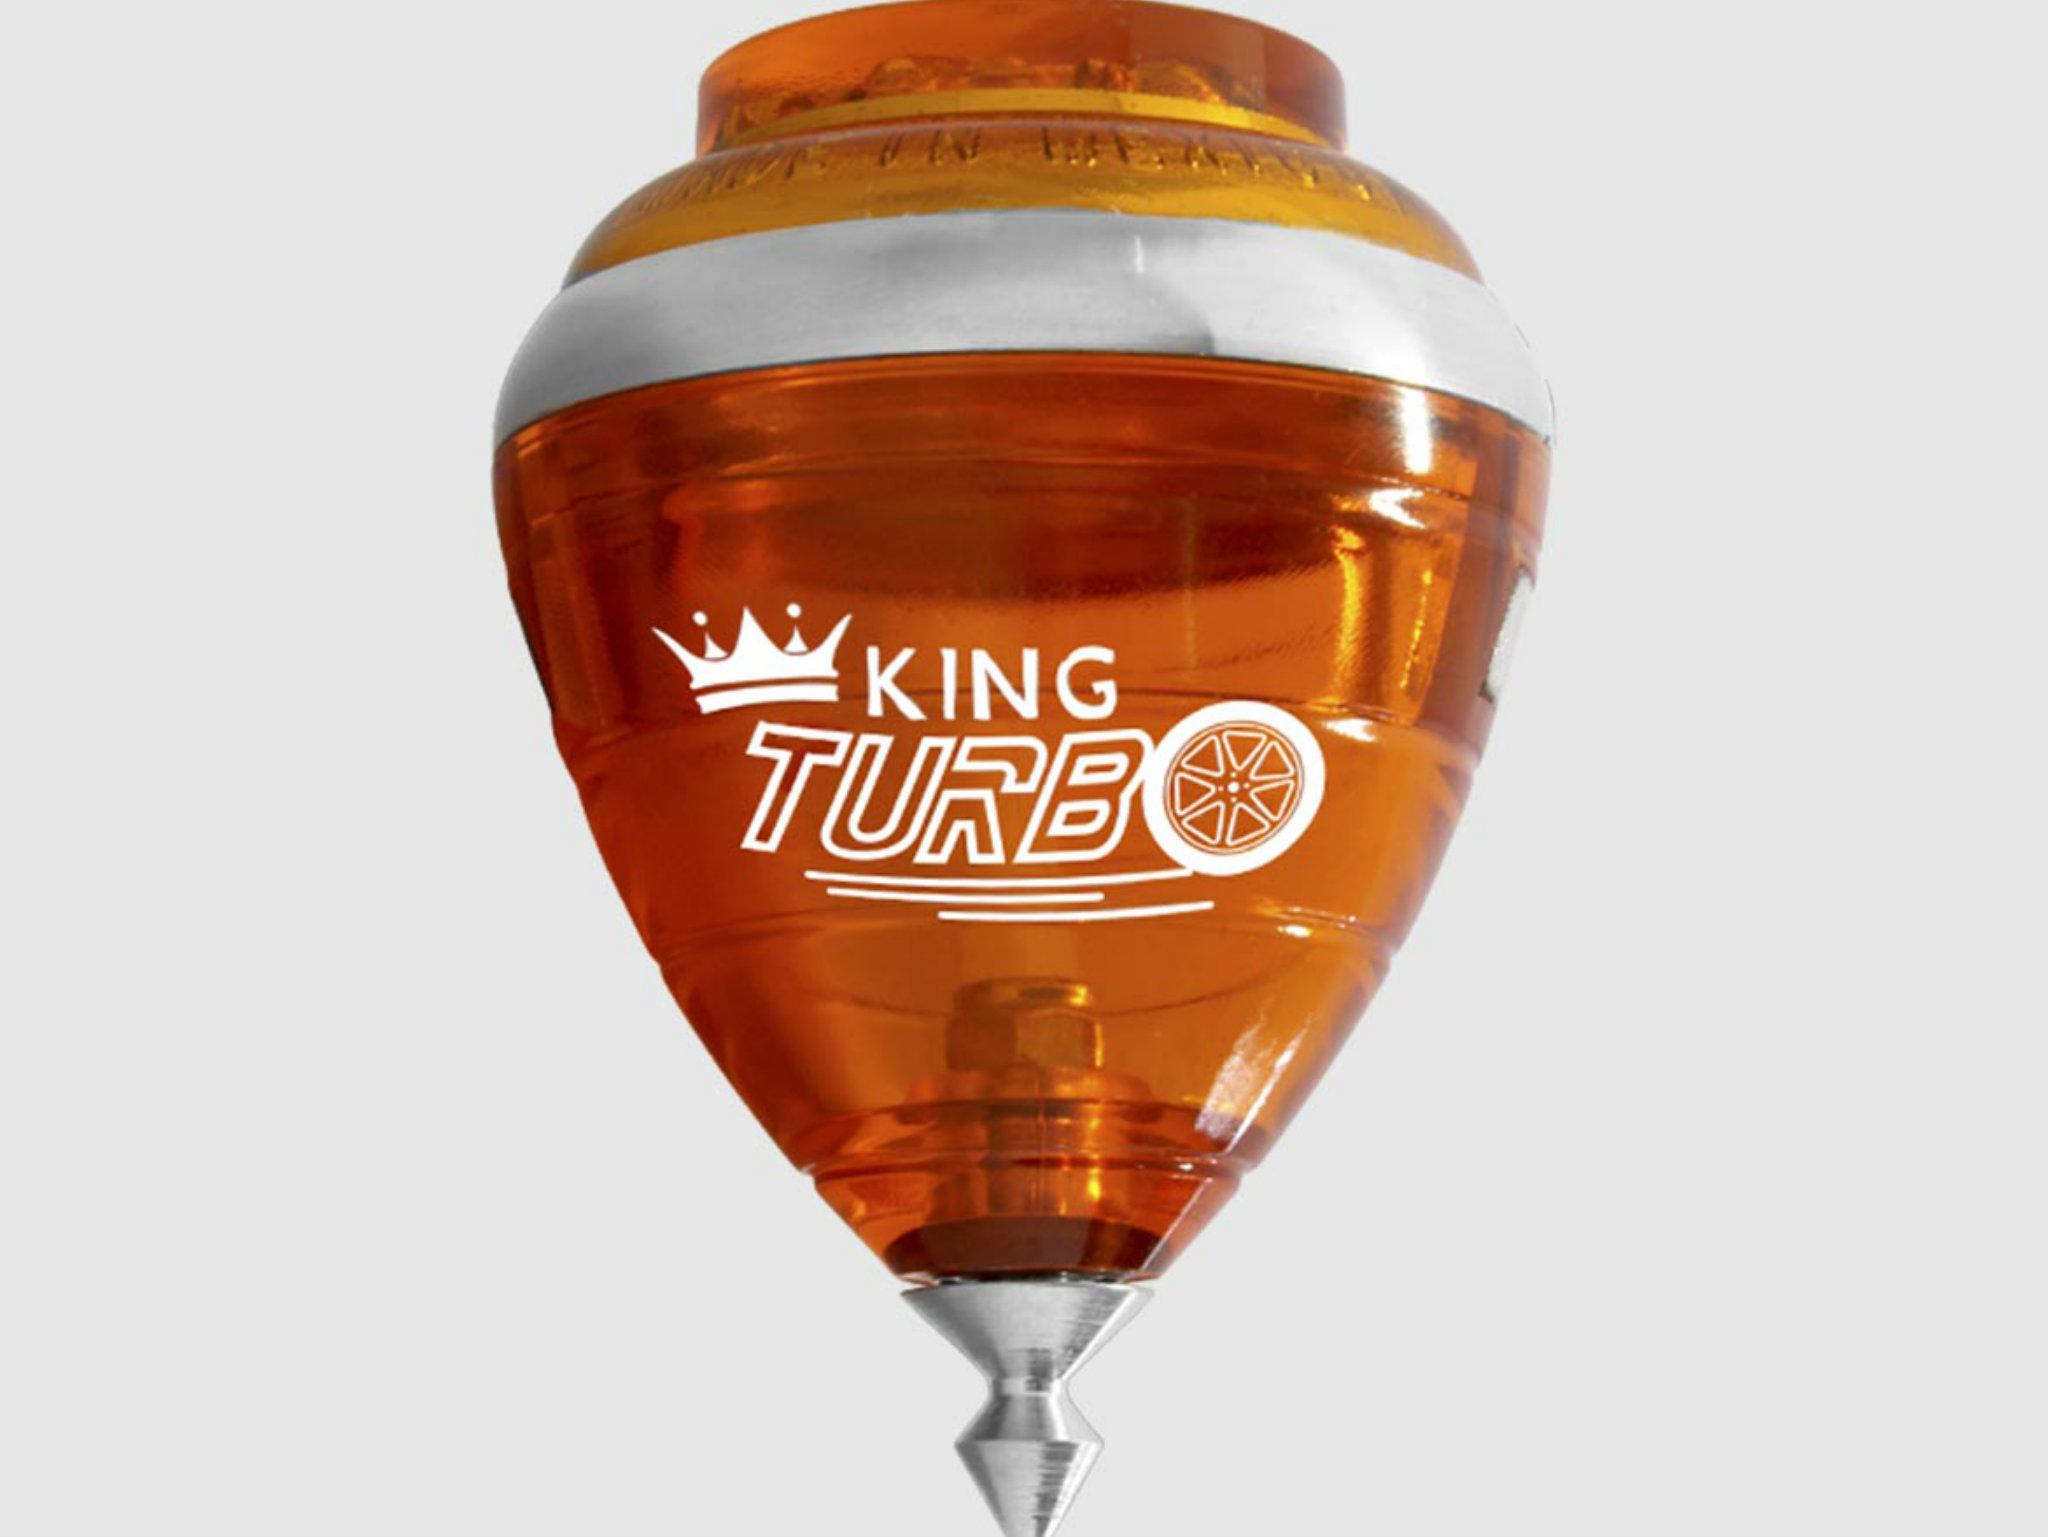 Trompo Cometa King Turbo Generic